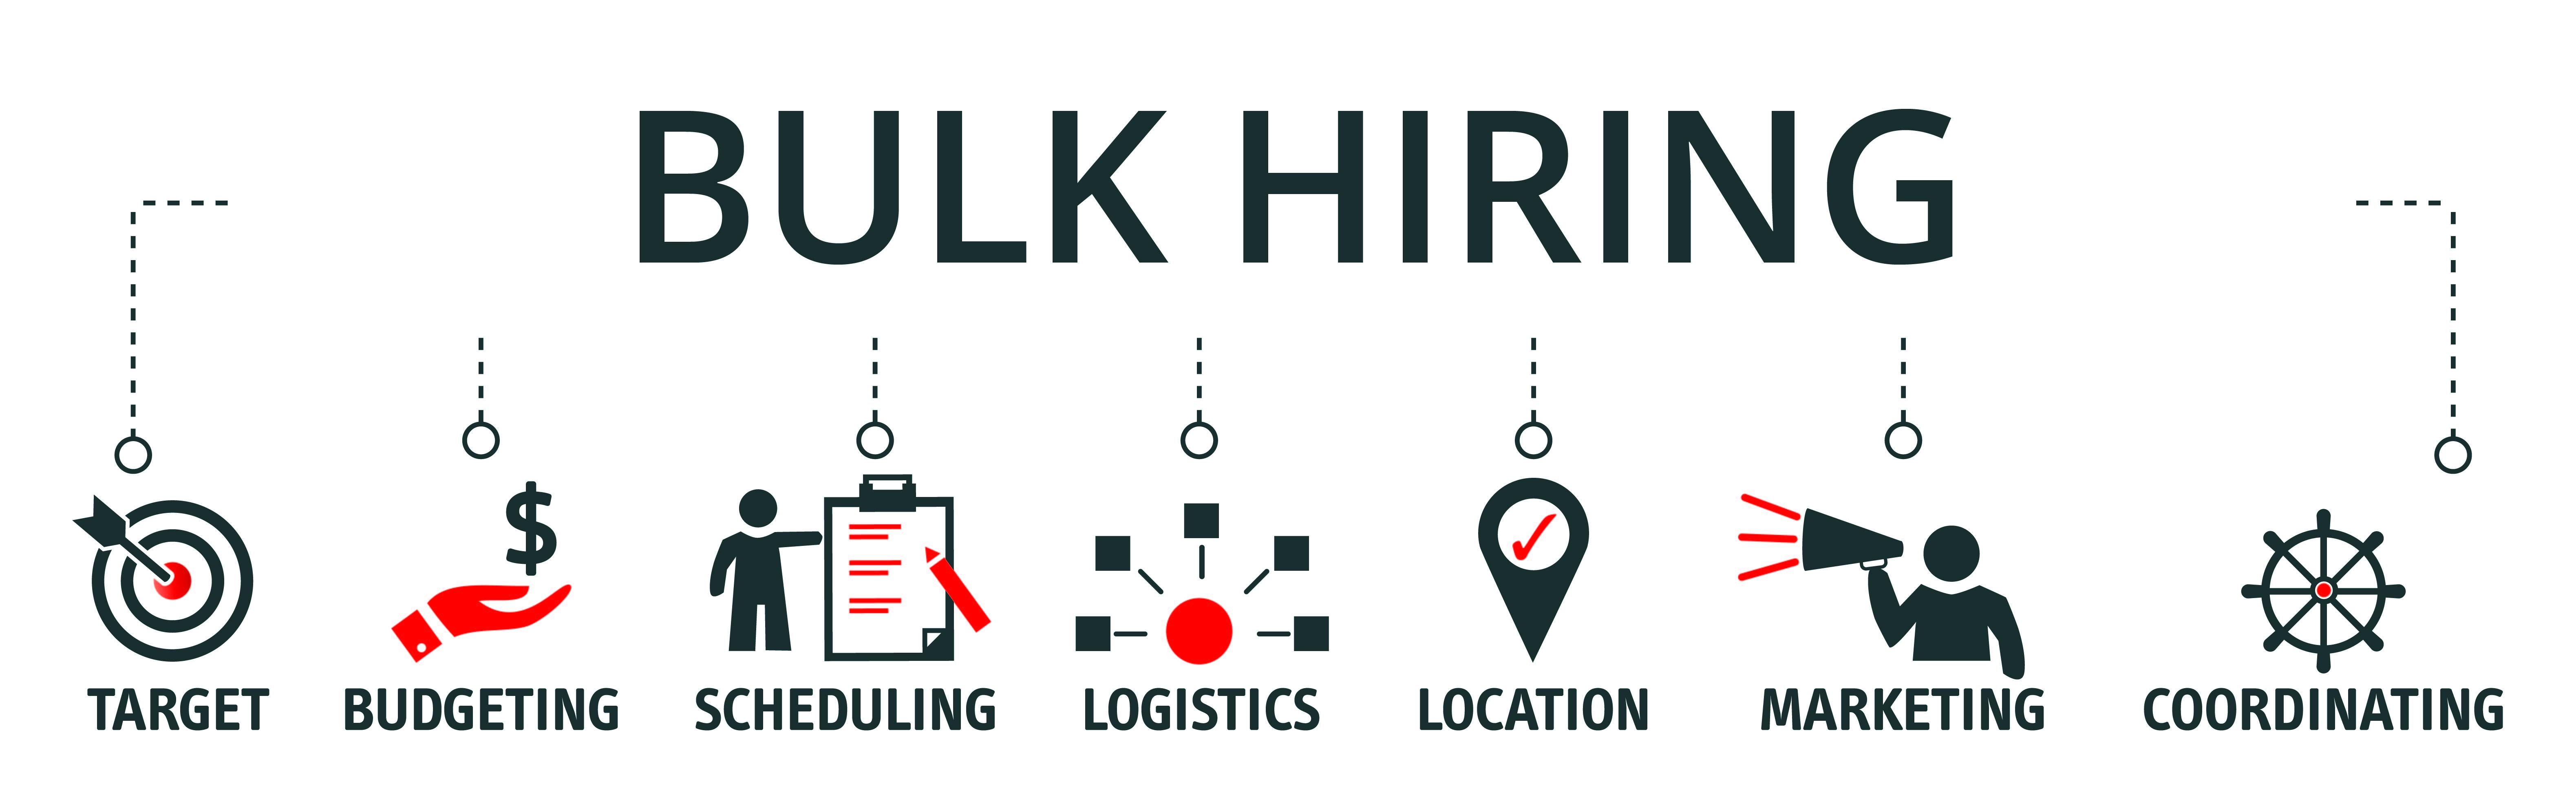 bulk hiring